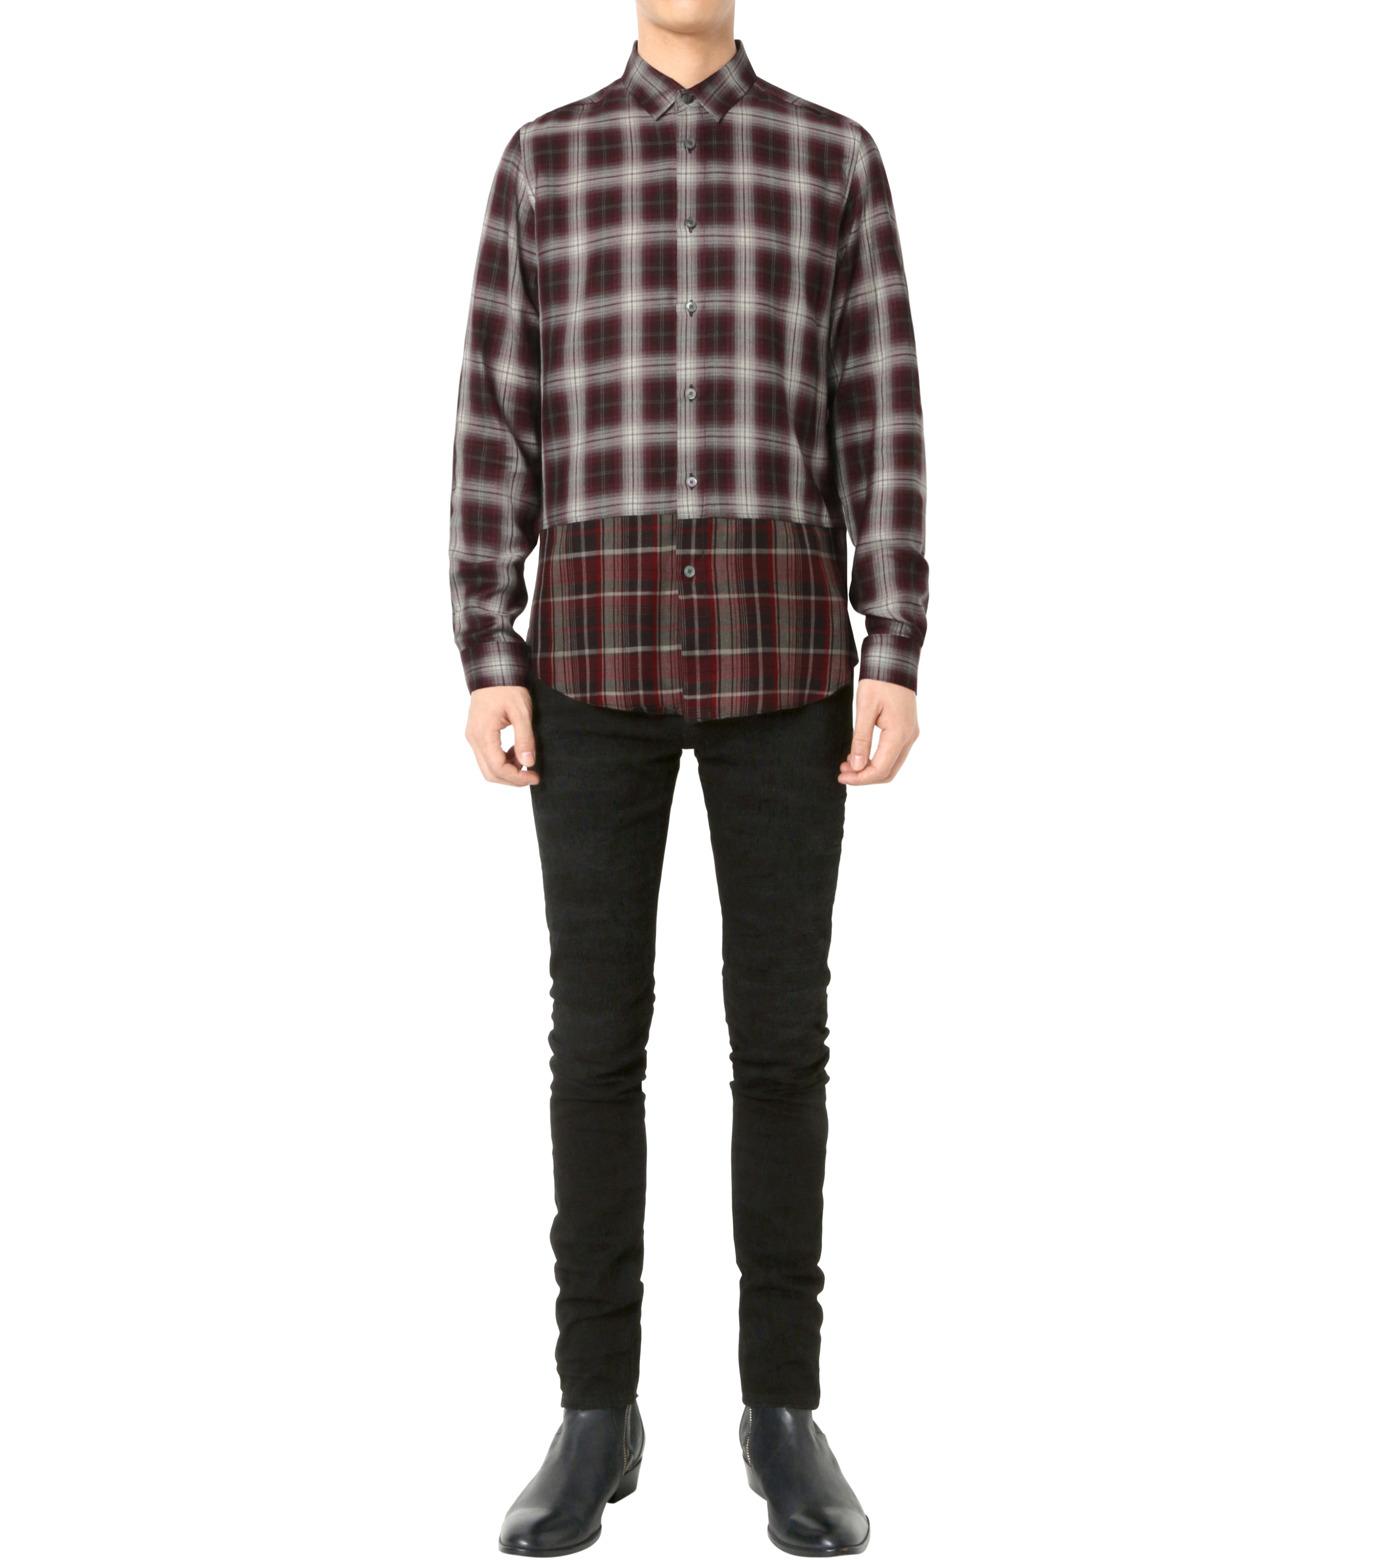 HL HEDDIE LOVU(エイチエル・エディールーヴ)のLAYERED CHECK SHIRT-BORDEAUX(シャツ/shirt)-18A93001-63 拡大詳細画像3